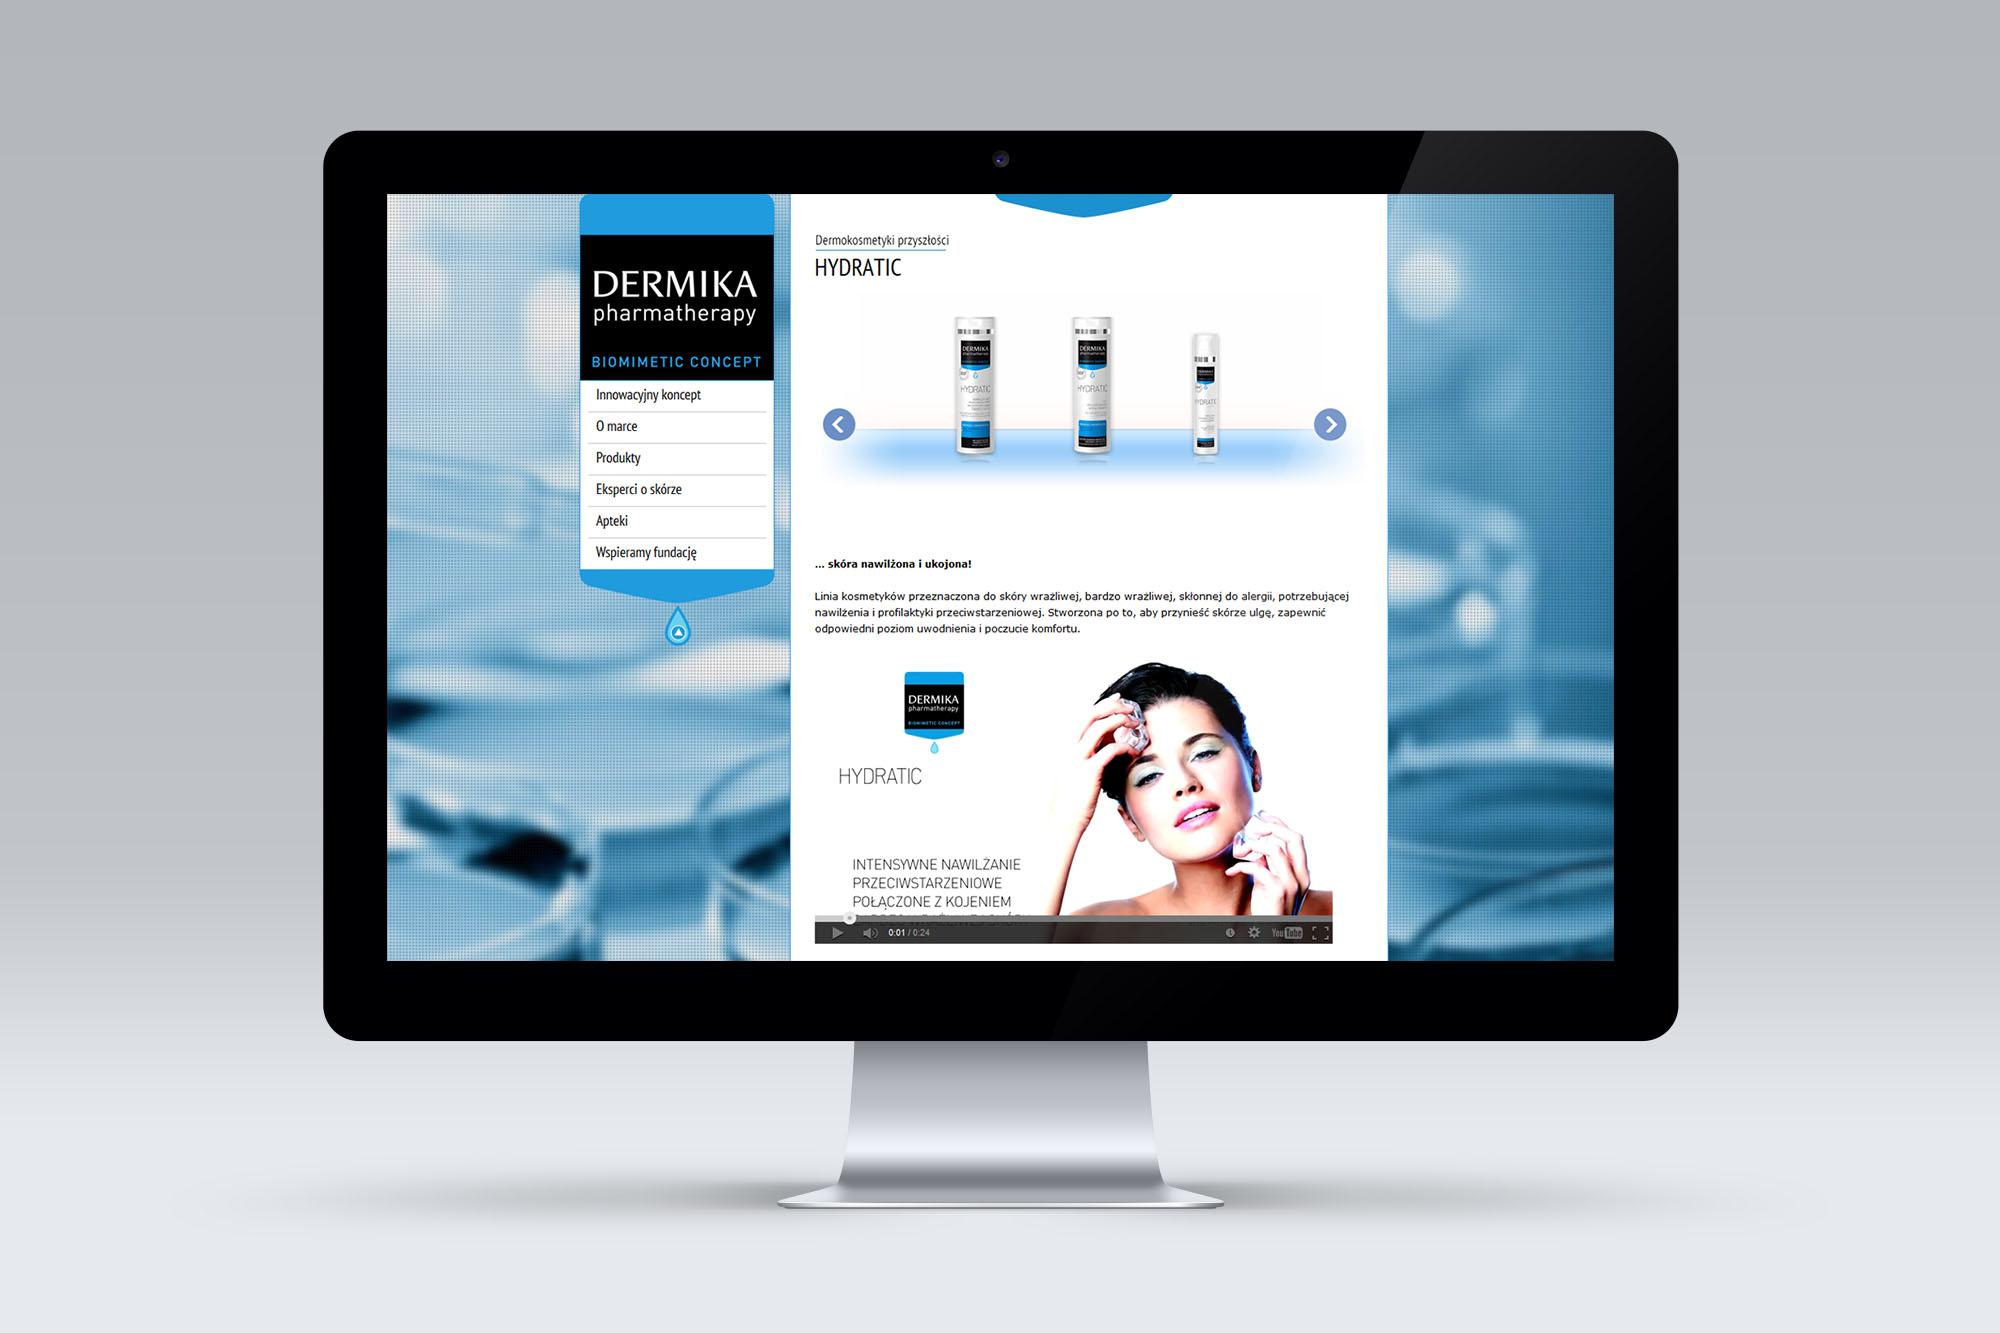 dermika pharma